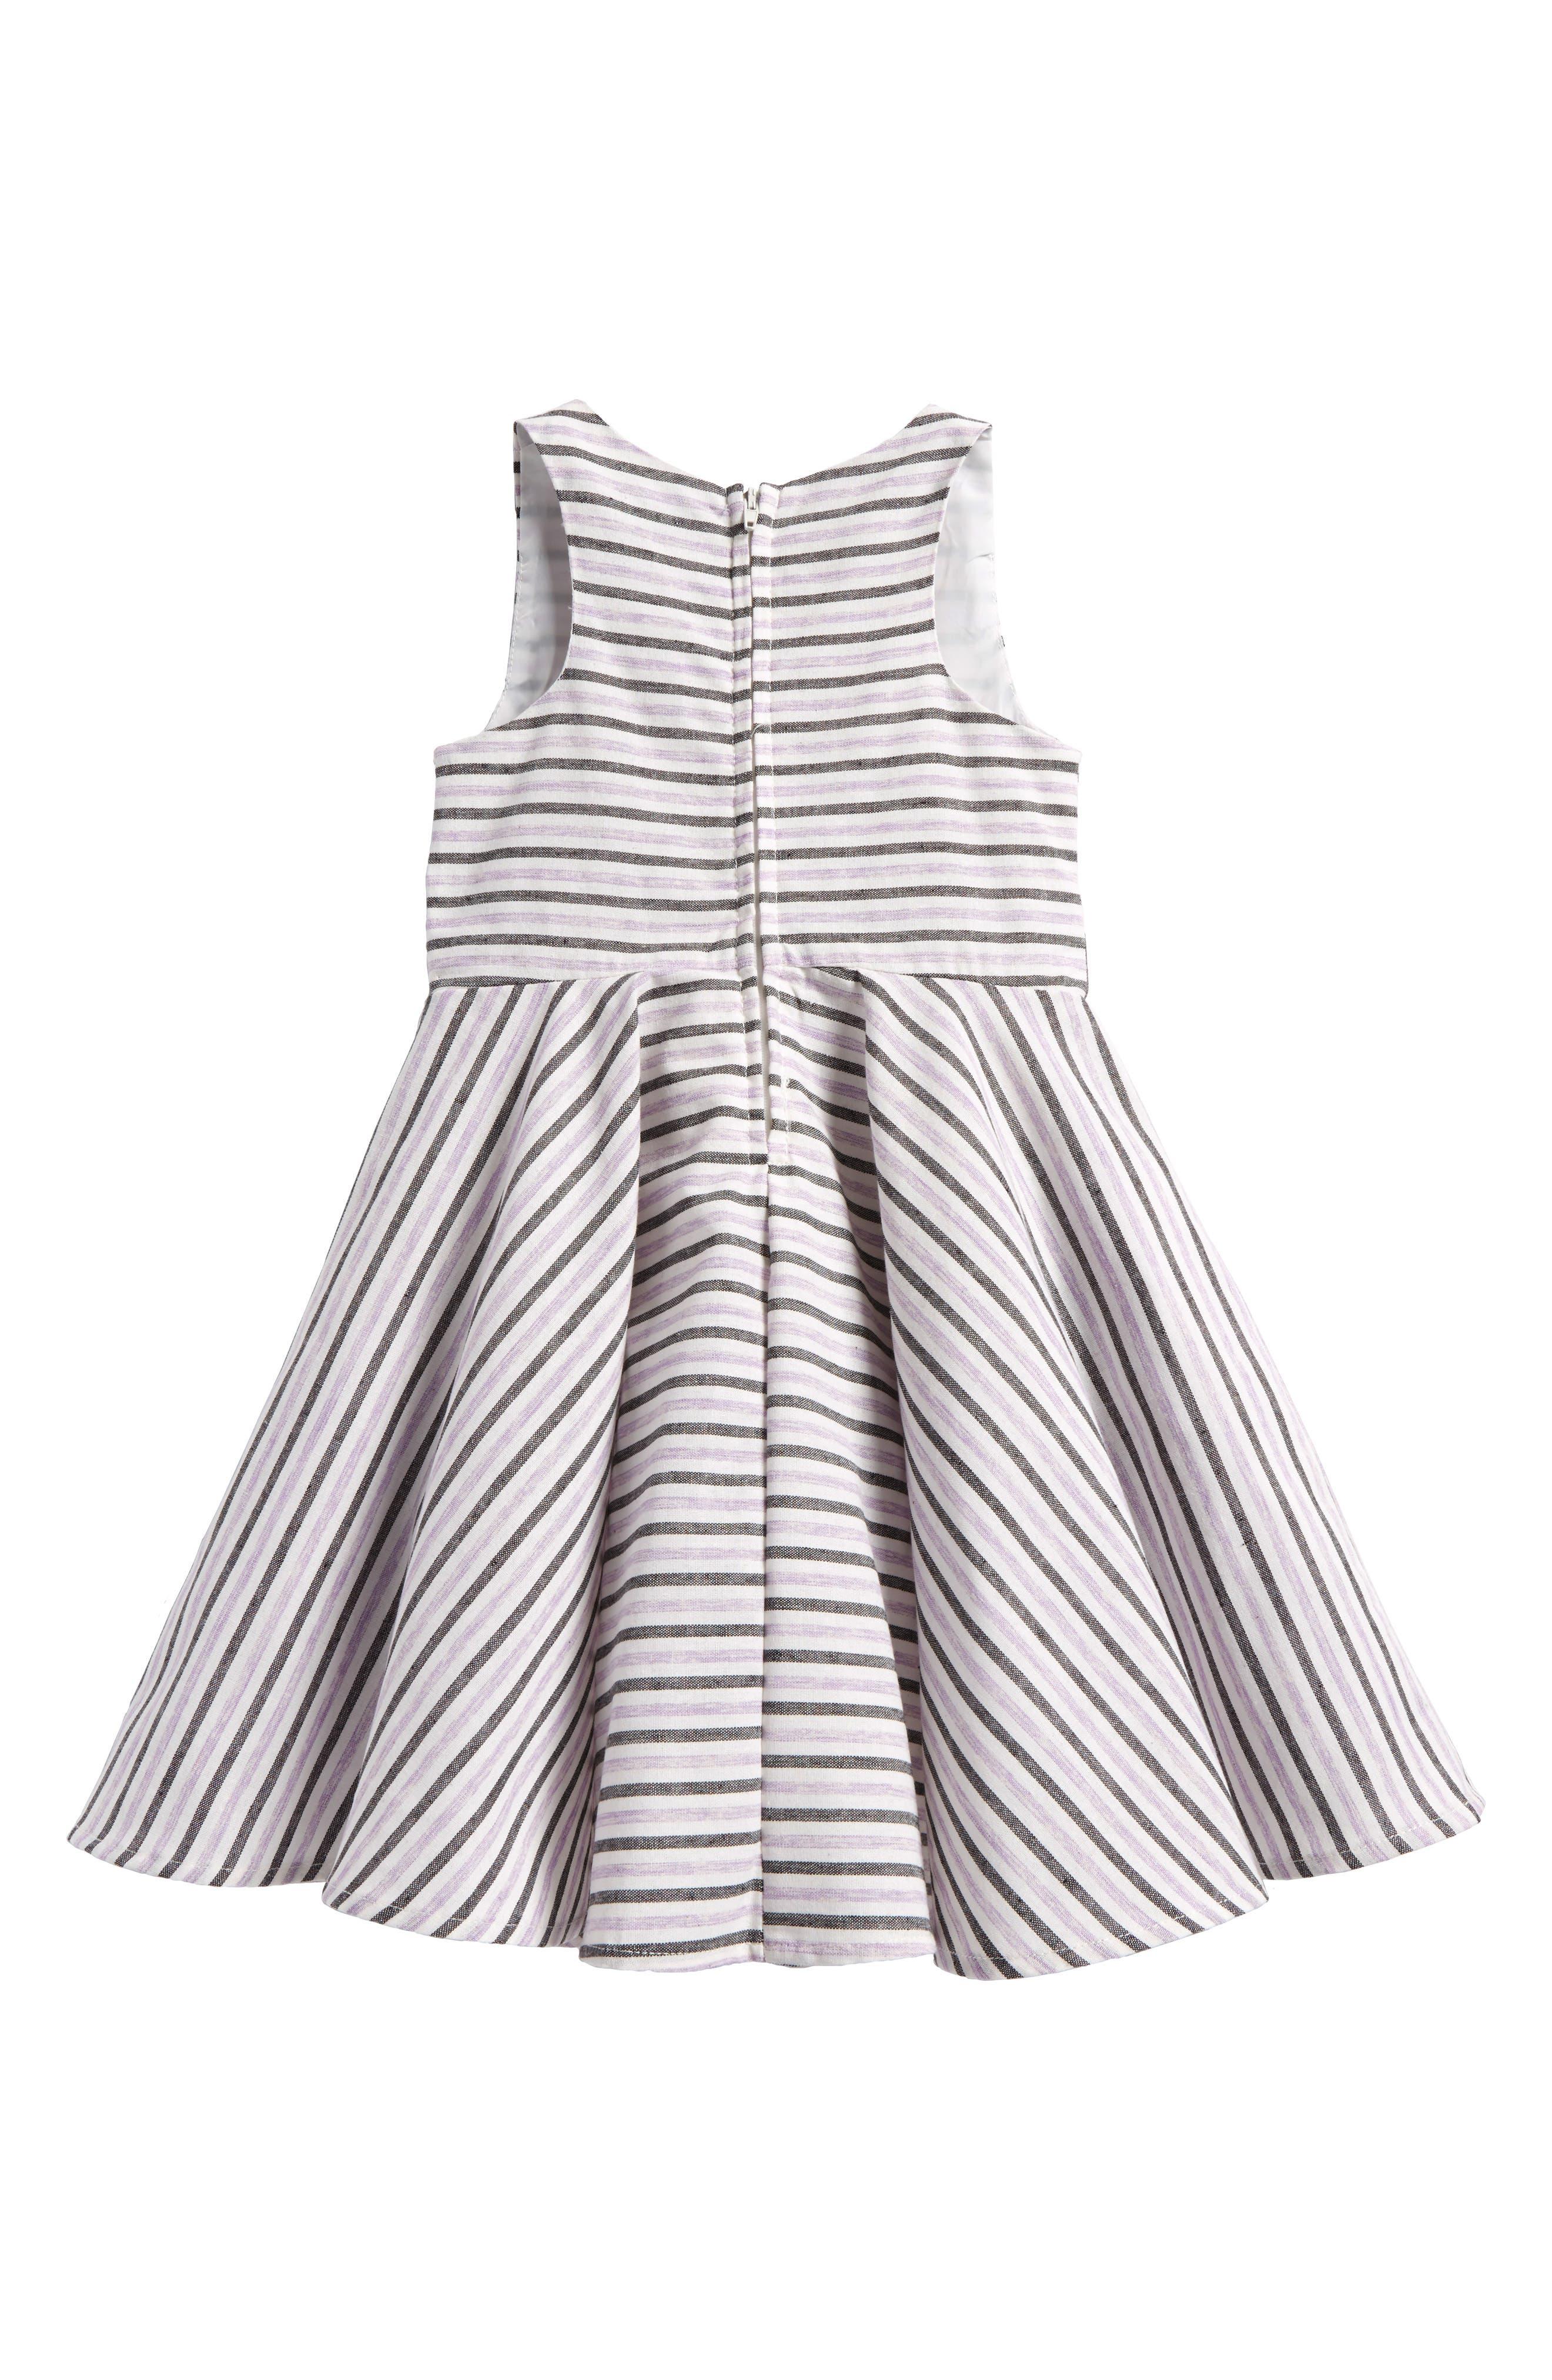 Stripe Cotton Dress,                             Alternate thumbnail 2, color,                             540